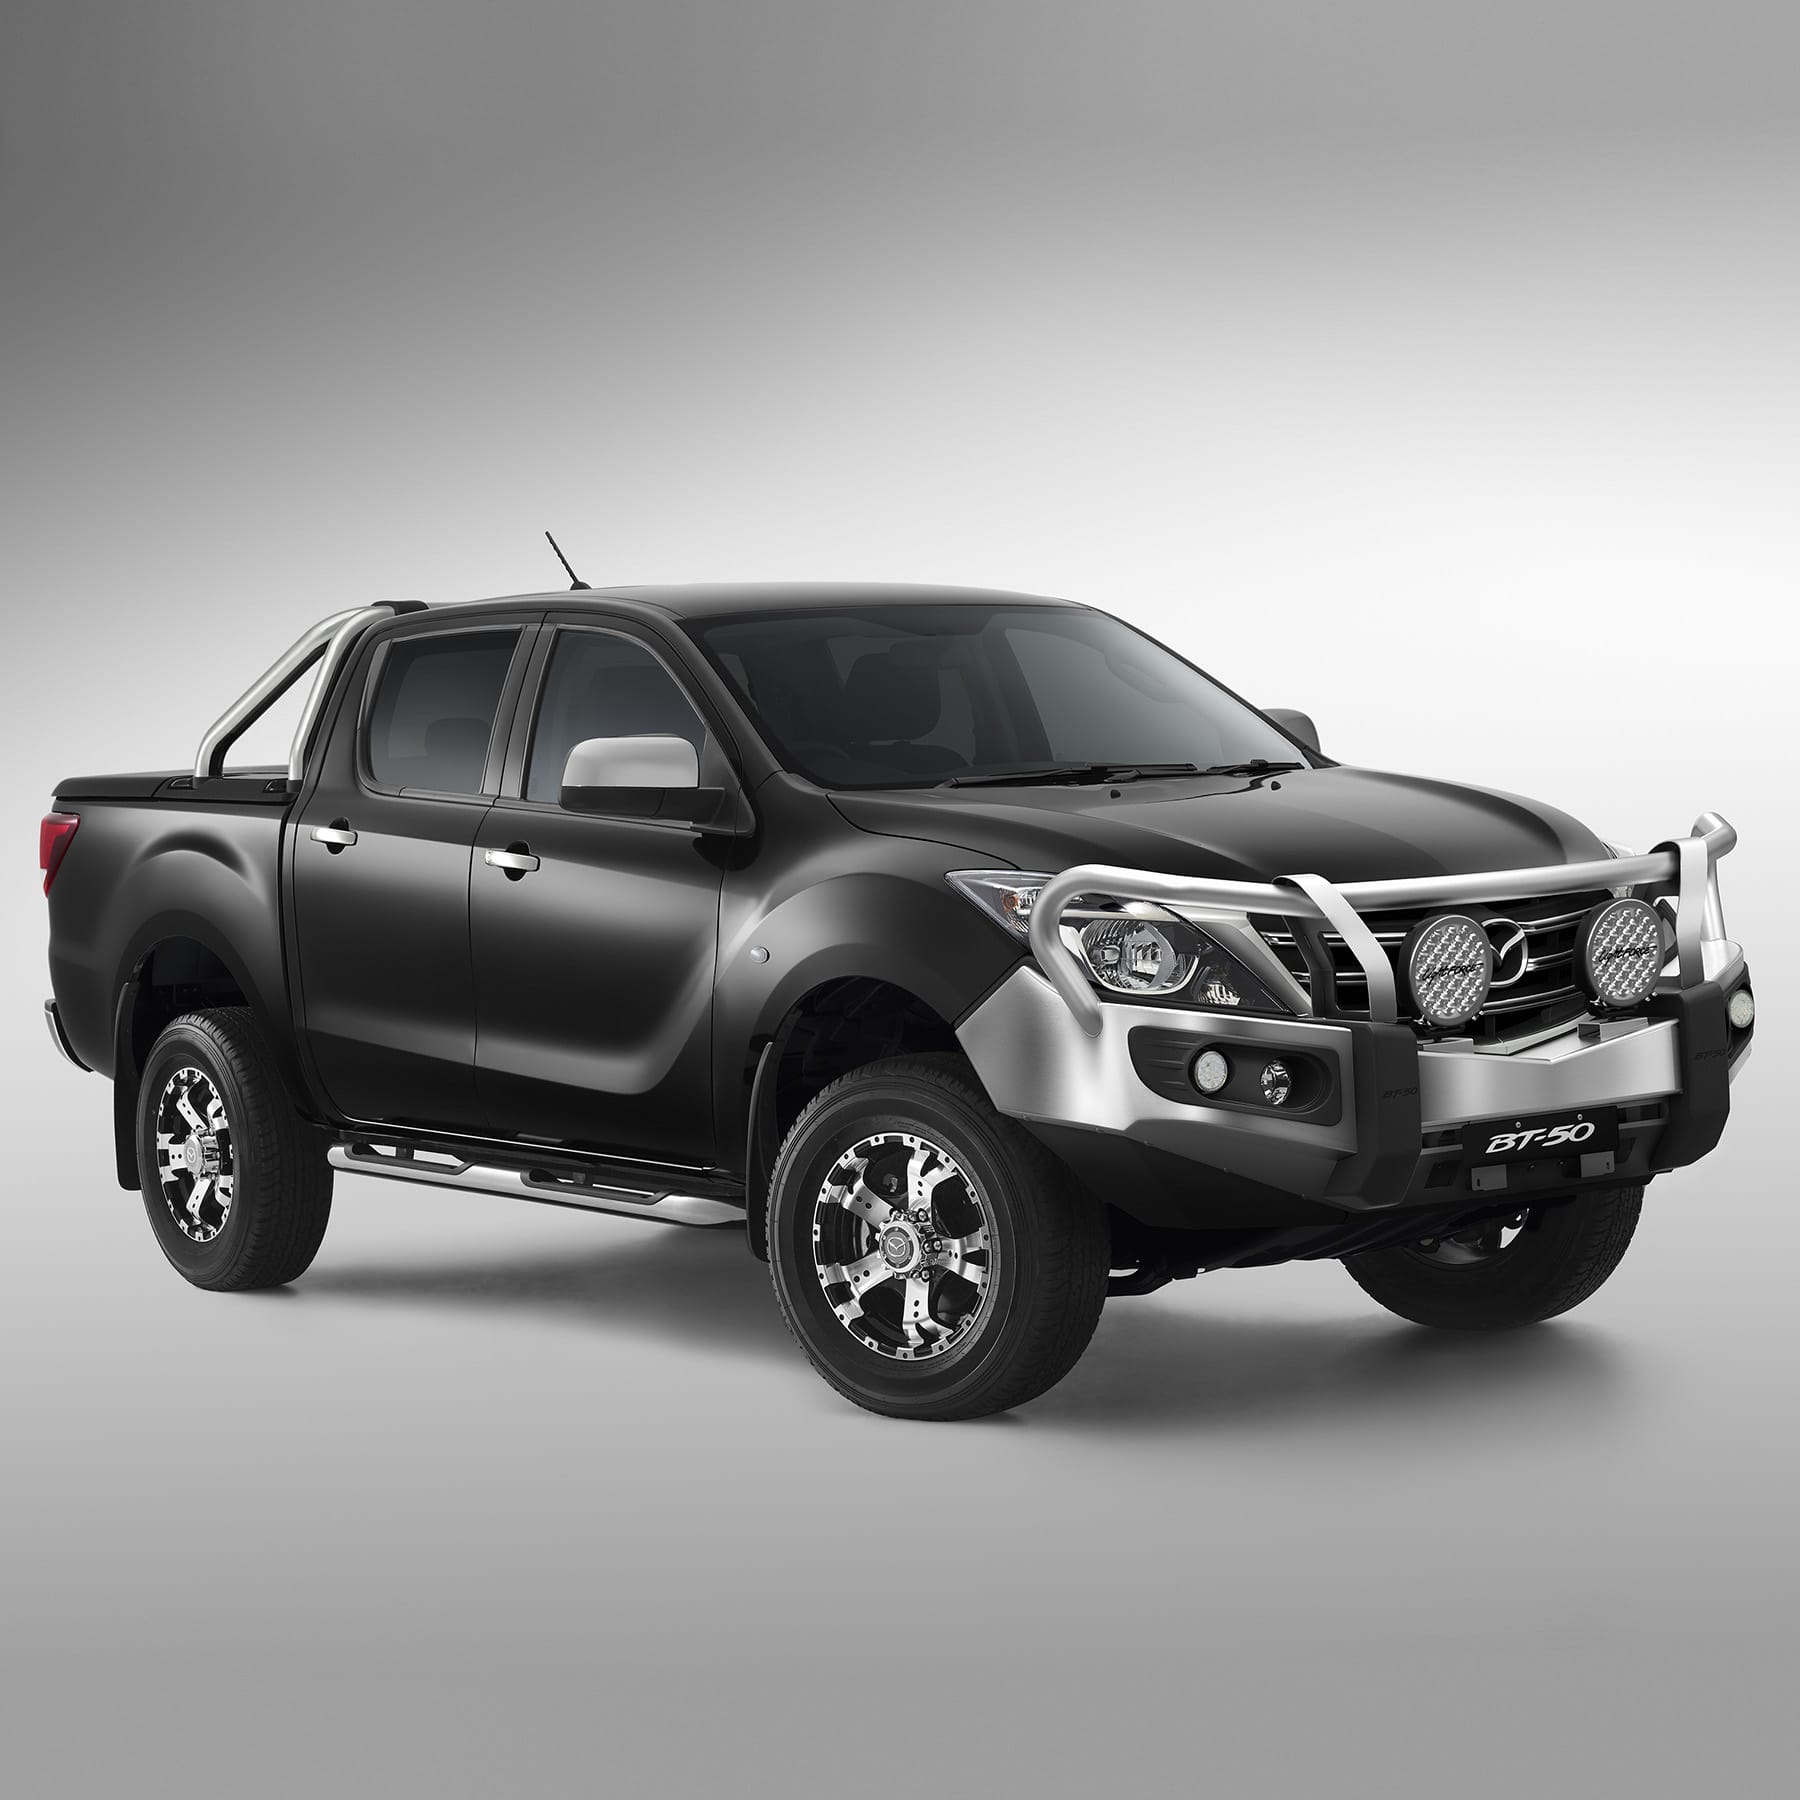 Mazda Accessories | Personalise Your Mazda BT-50